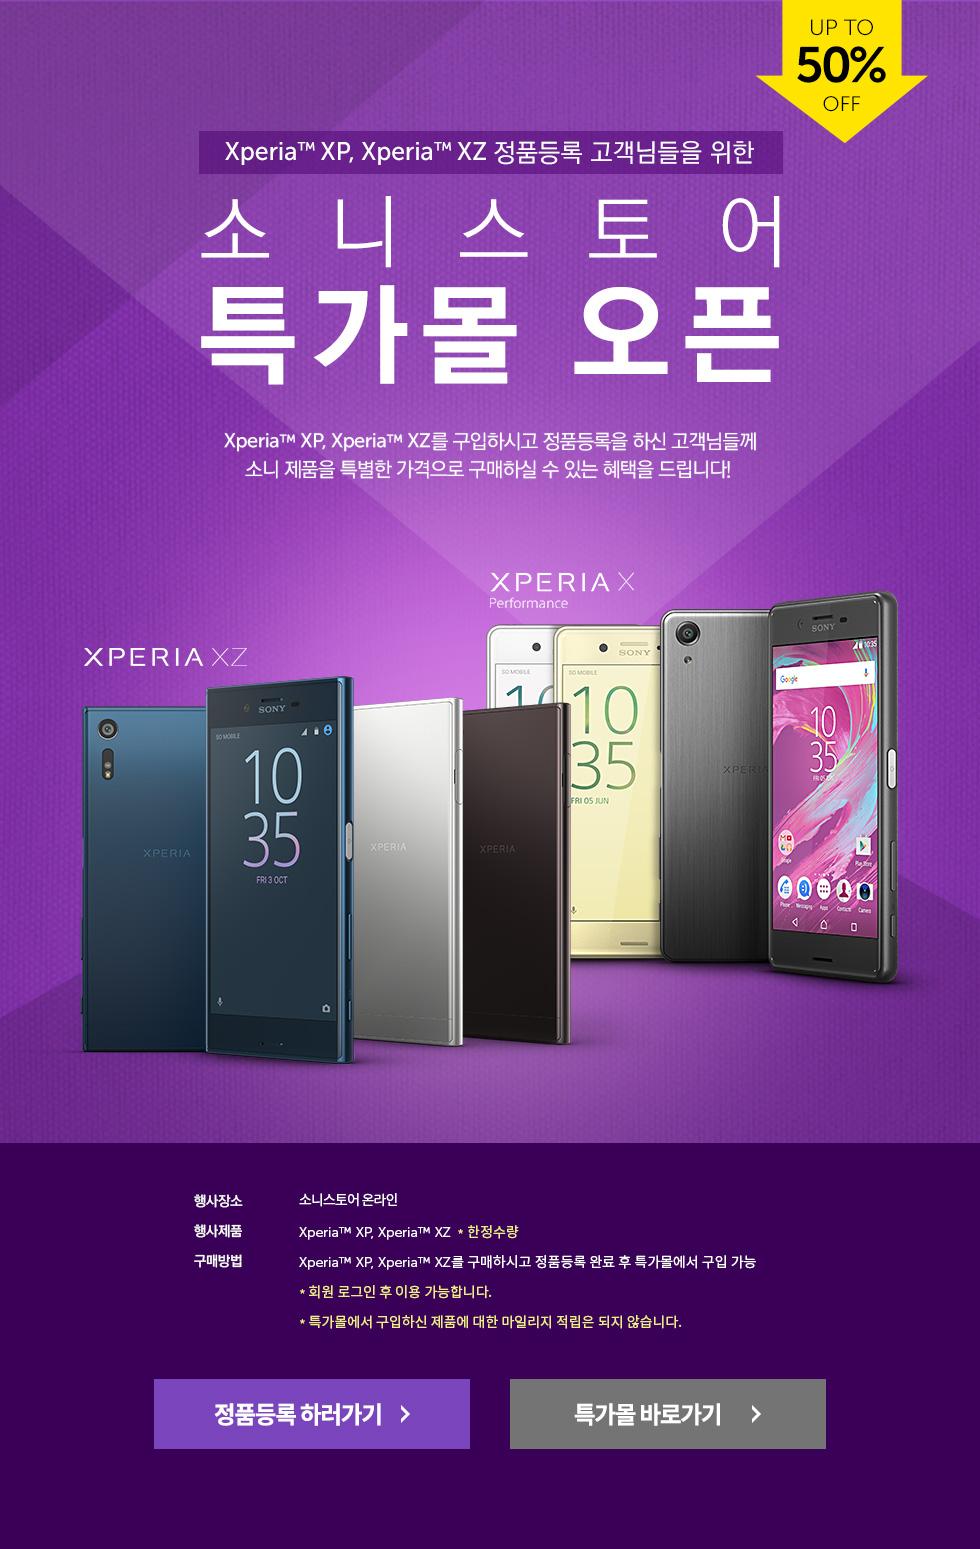 Xperia XP XZ 정품등록 고객 대상 특가몰 오픈